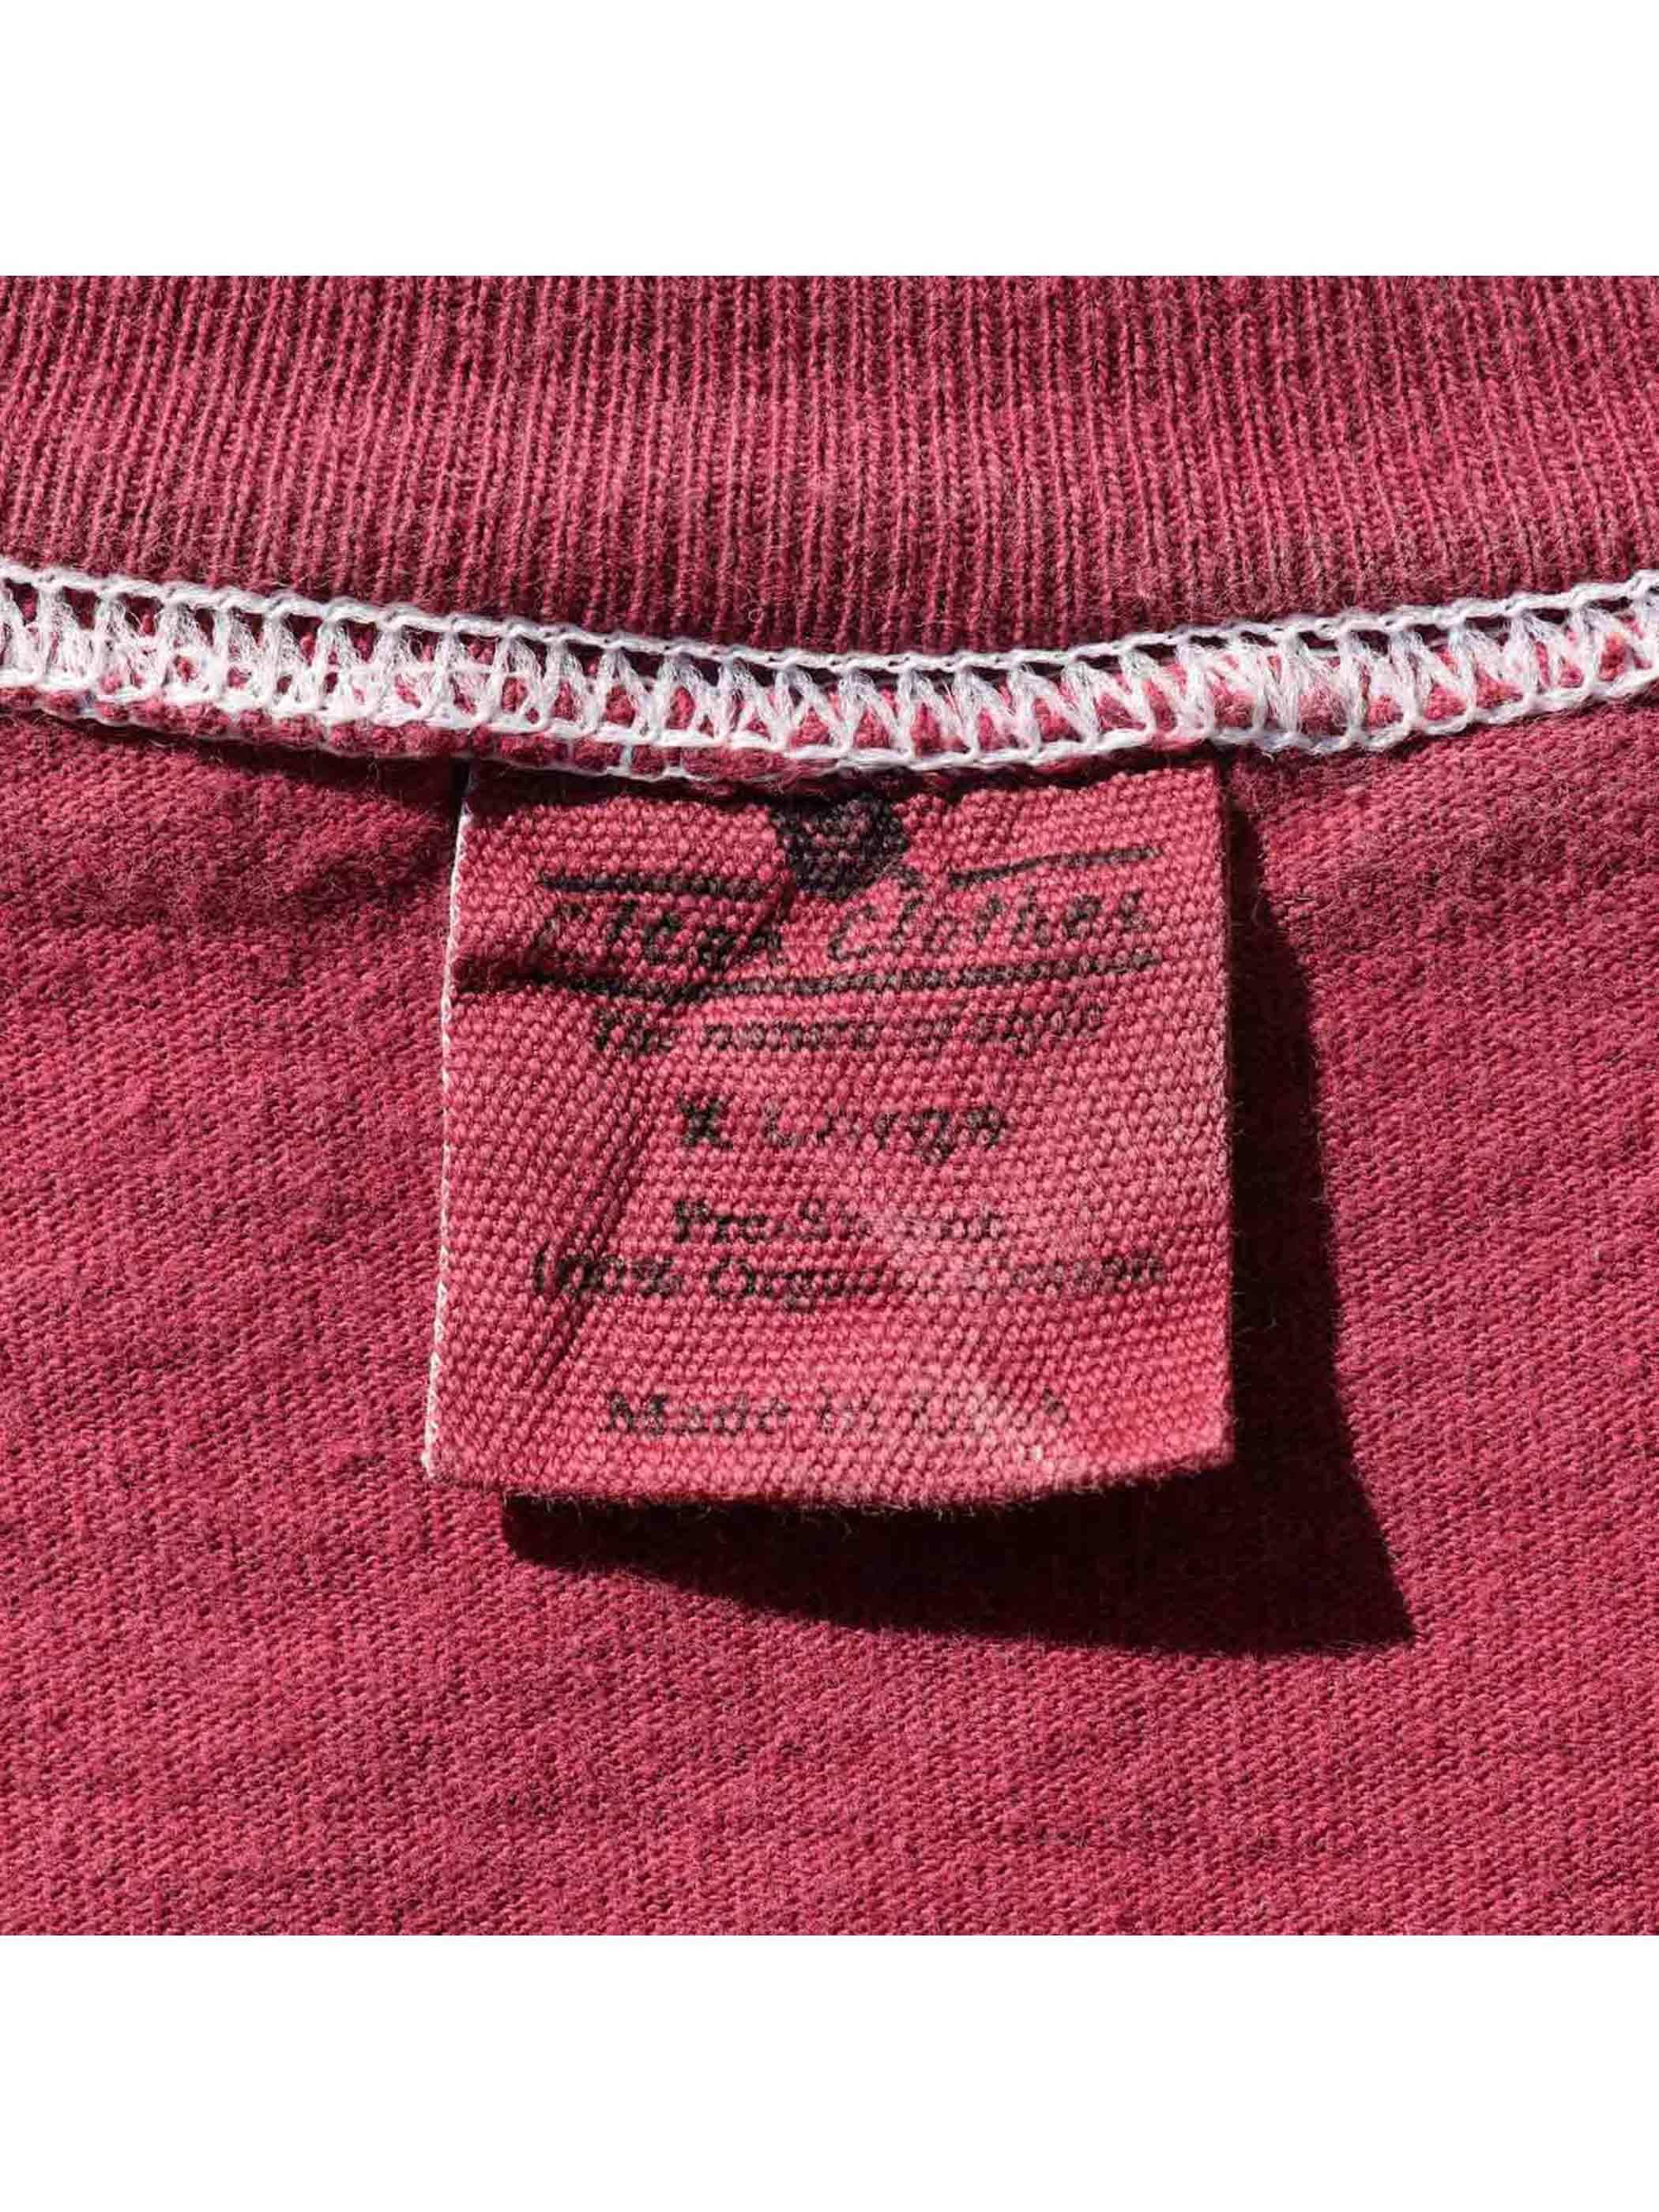 90's TIBETAN FREEDOM CONCERT 1998 USA製 Tシャツ [XL]